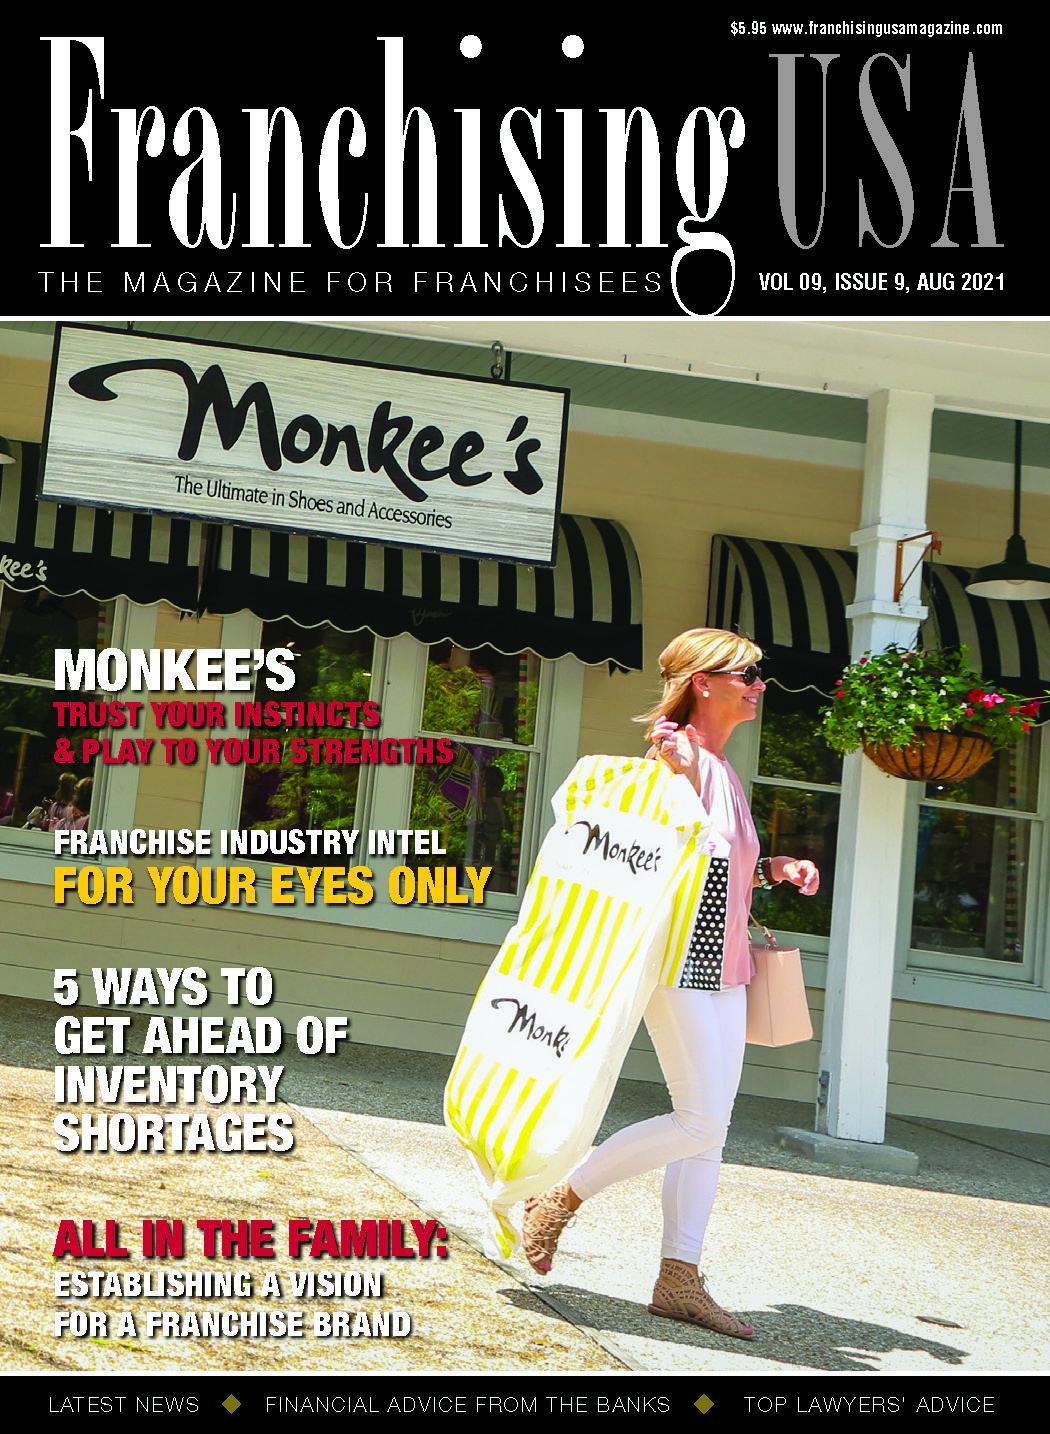 Franchising USA Cover May 2021